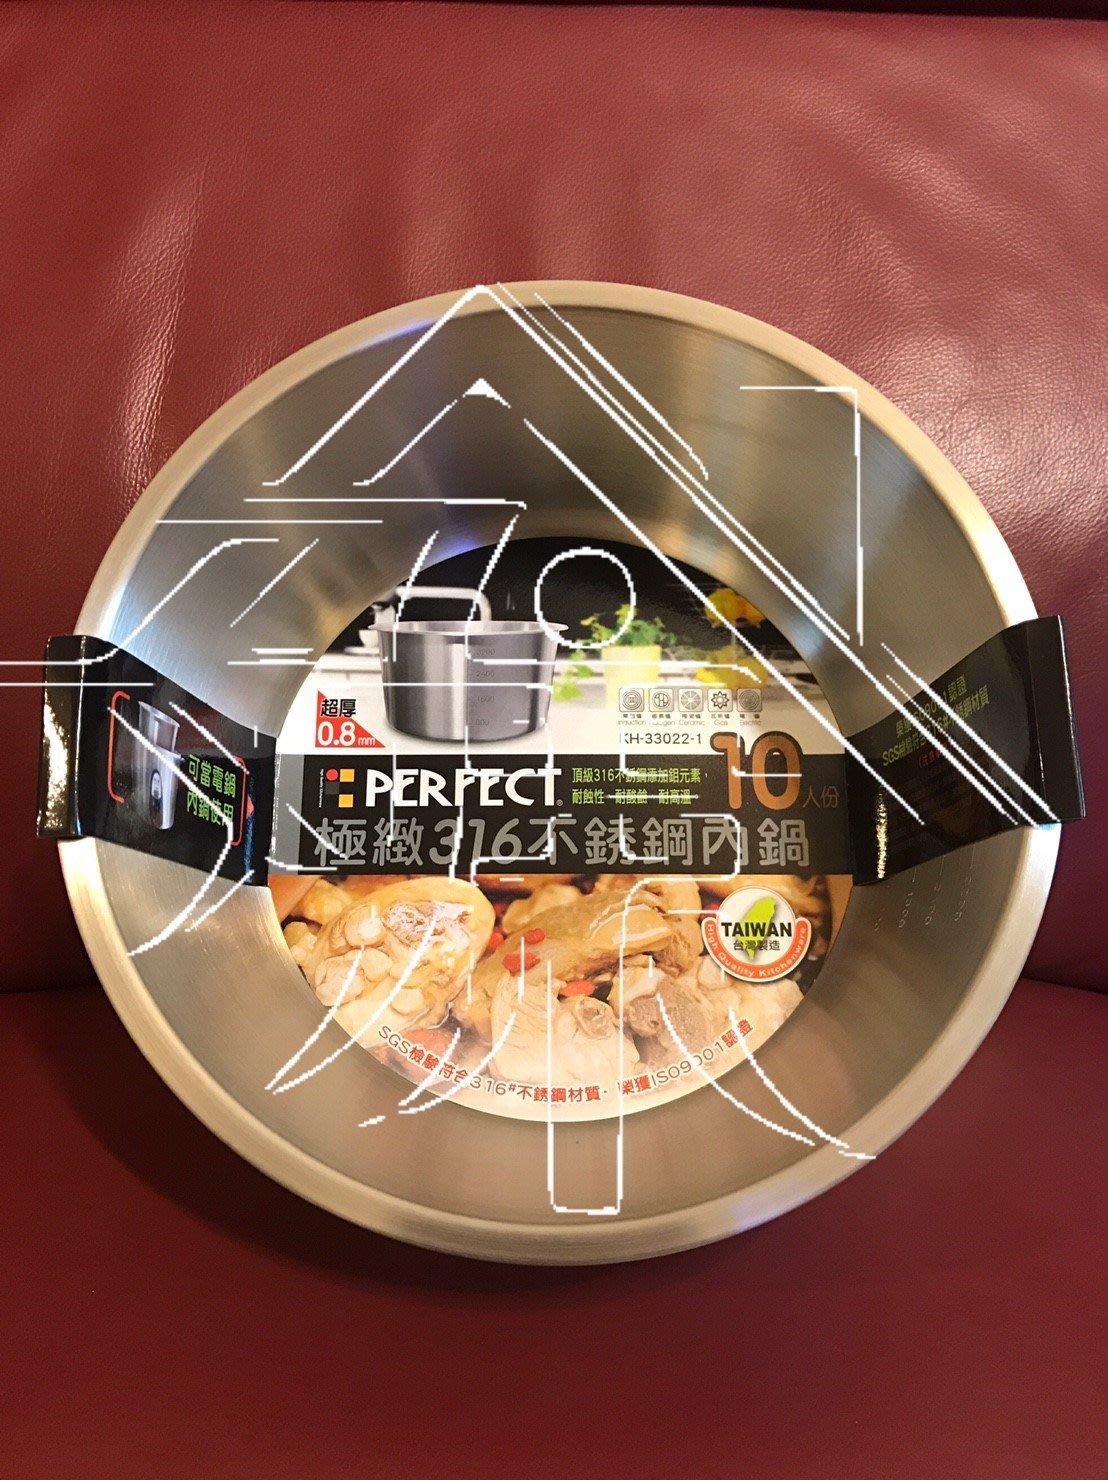 PERFECT 極緻316不鏽鋼內鍋-10人份 耐酸鹼 台灣製造 好康屋